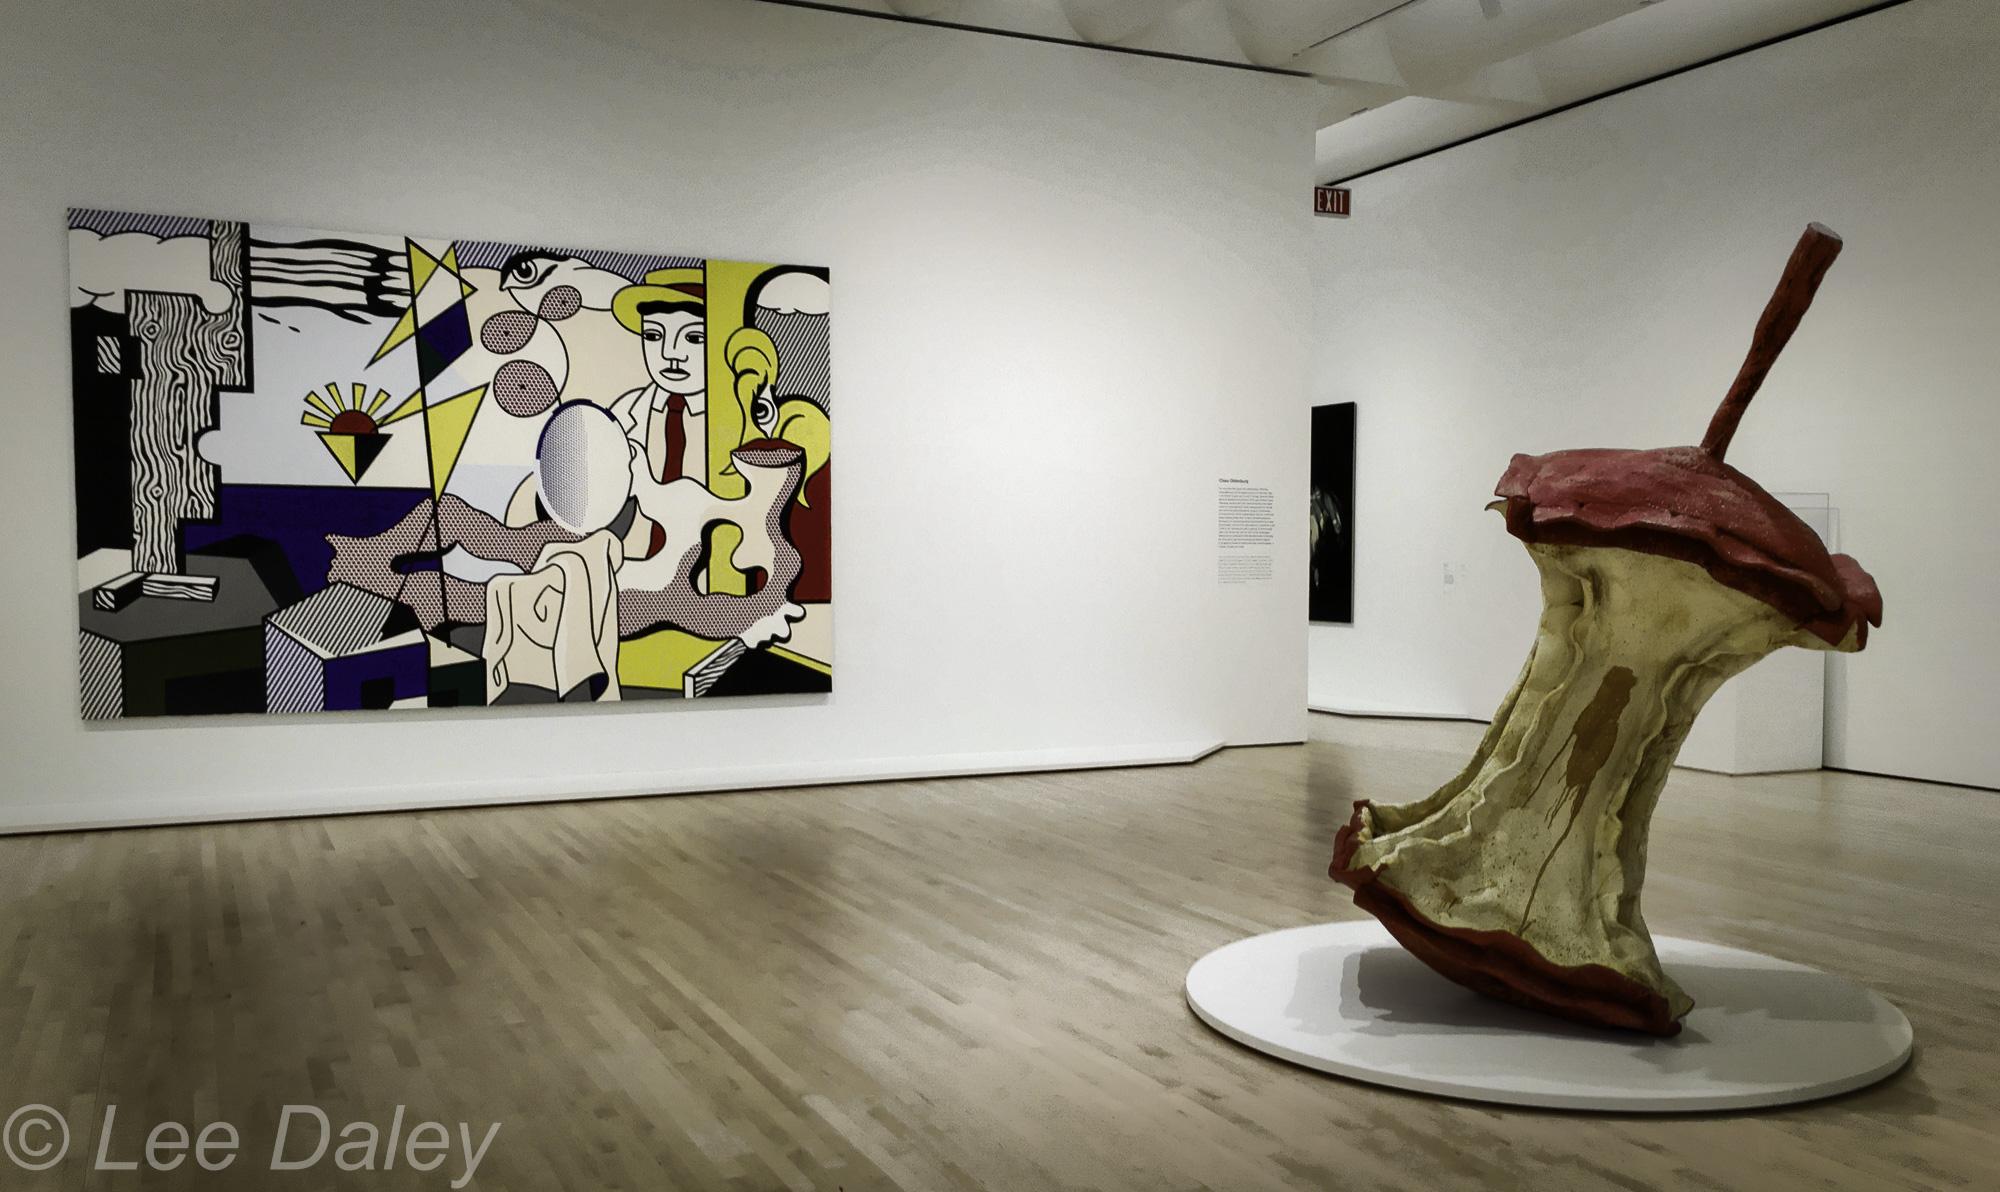 San Francisco Museum of Modern Art, SFMOMA, San Francisco, sculpture by Claes Oldenburg